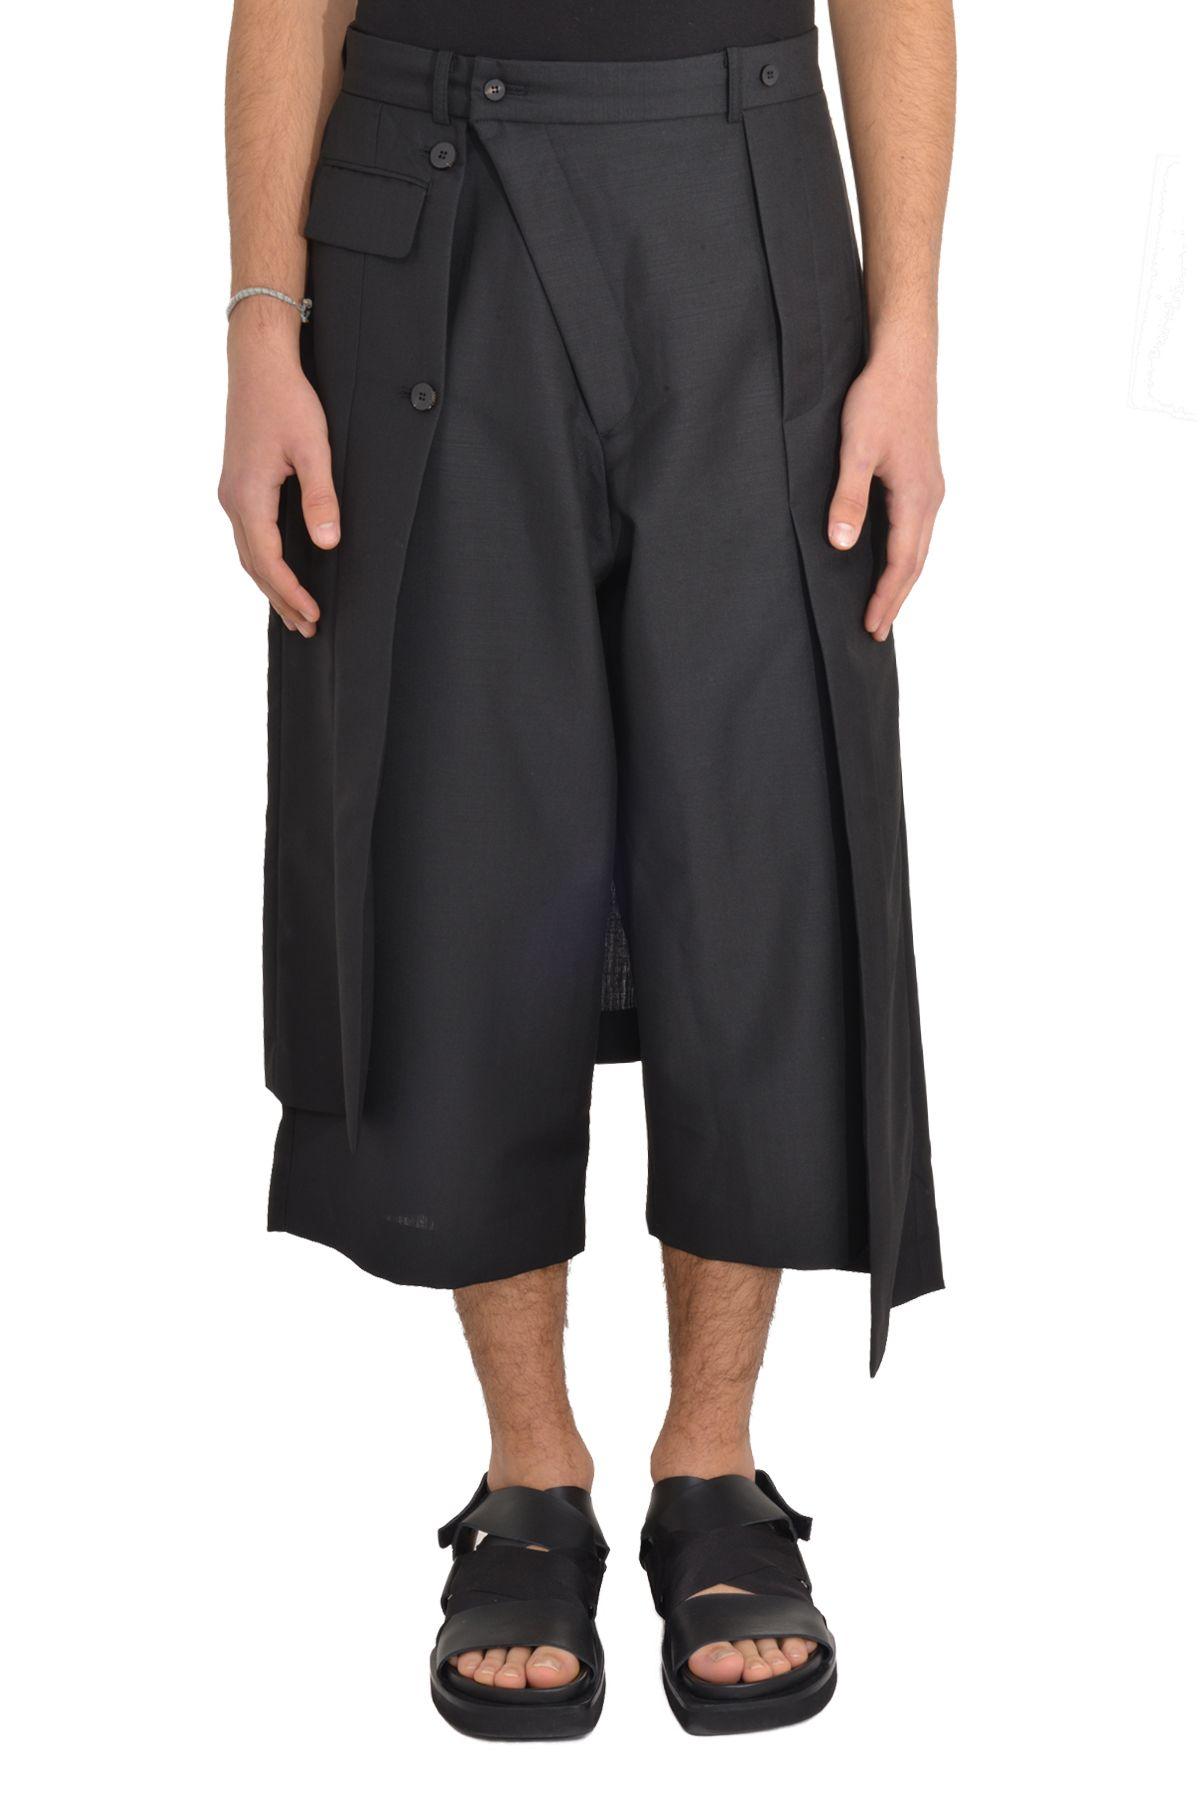 7543 Asymmetric Skirt Layered Shorts